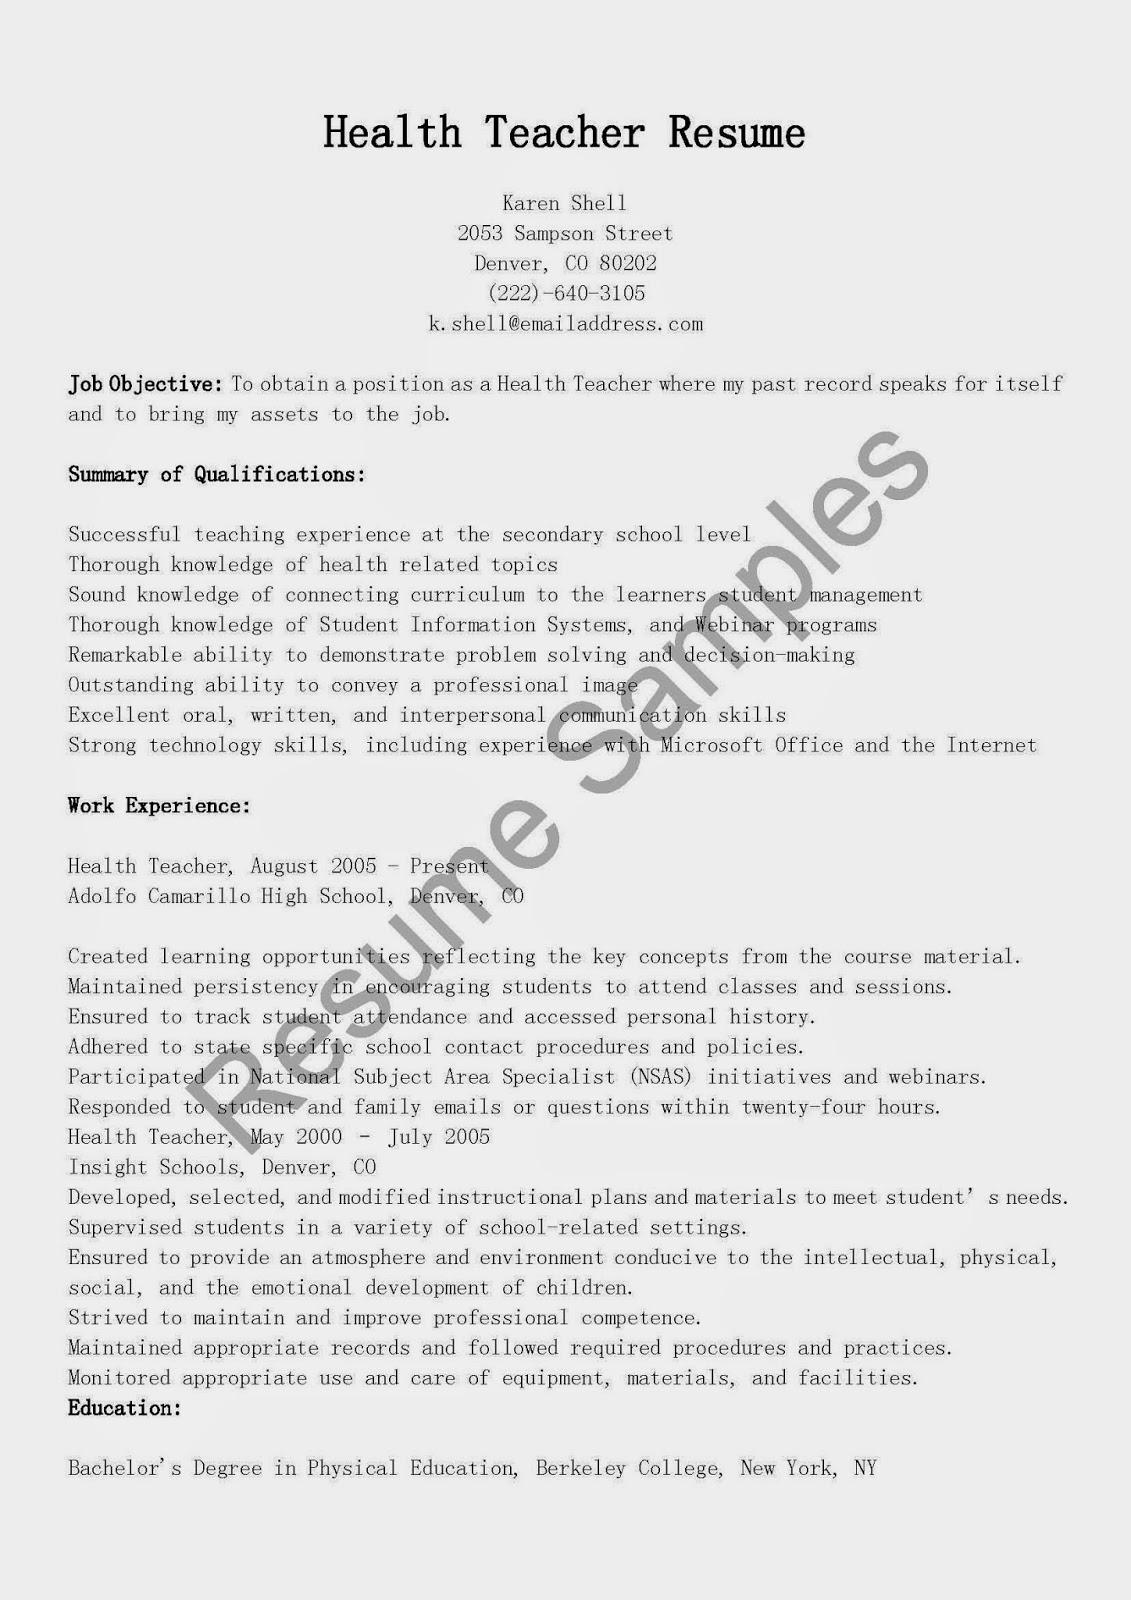 resume sles health resume sle